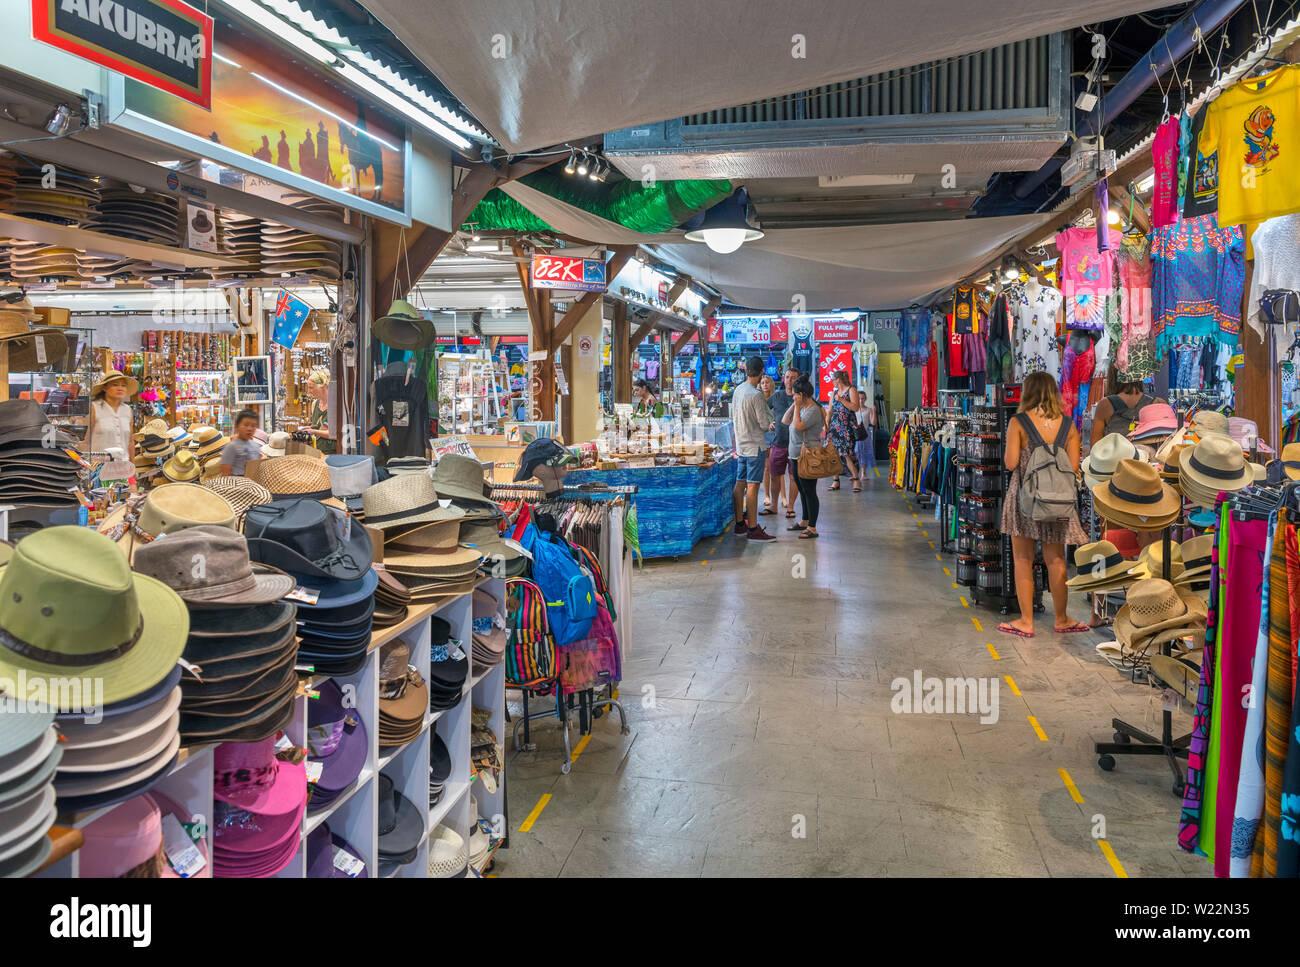 Negozi in Cairns mercati notturni, Cairns, Queensland, Australia Immagini Stock